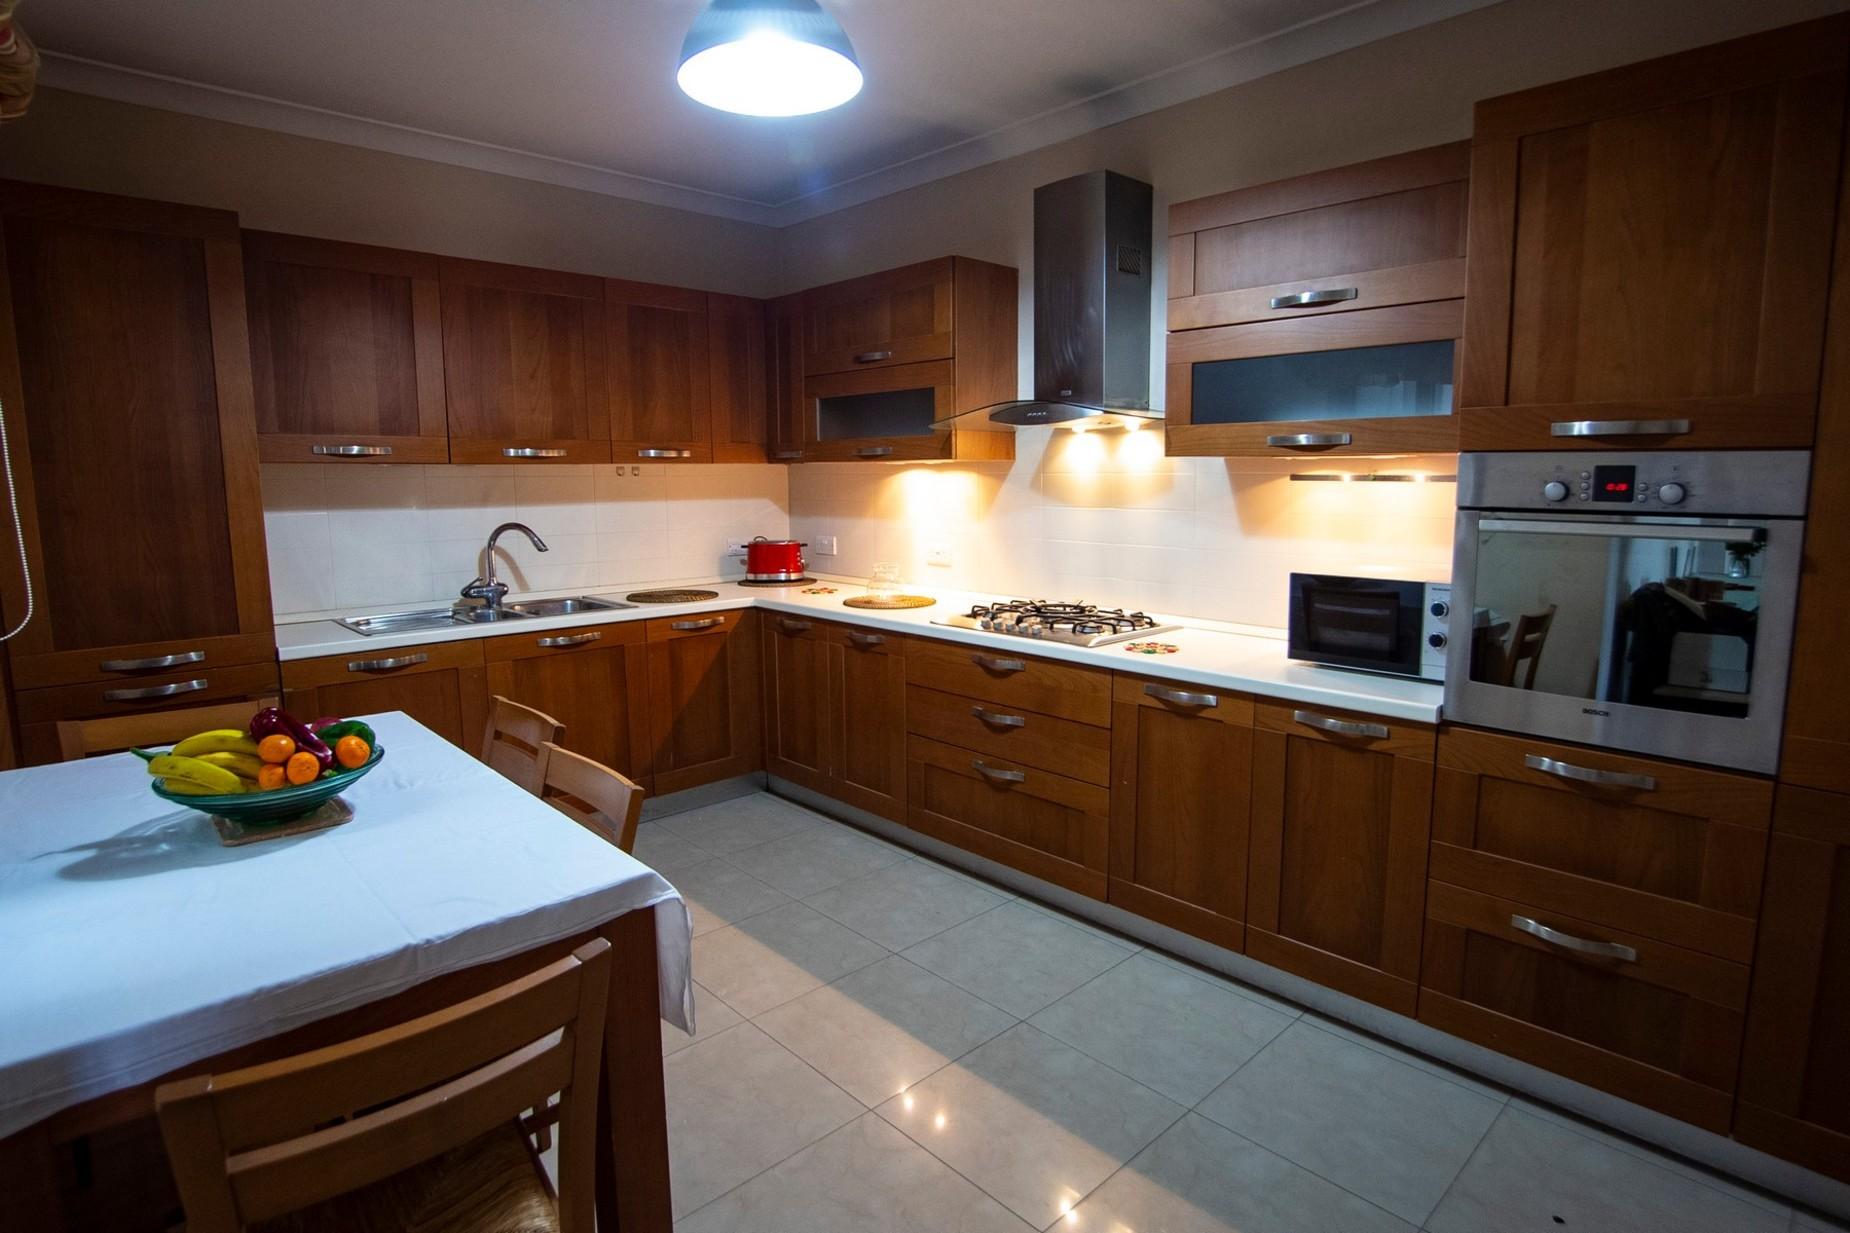 4 bed Apartment For Rent in Naxxar, Naxxar - thumb 4